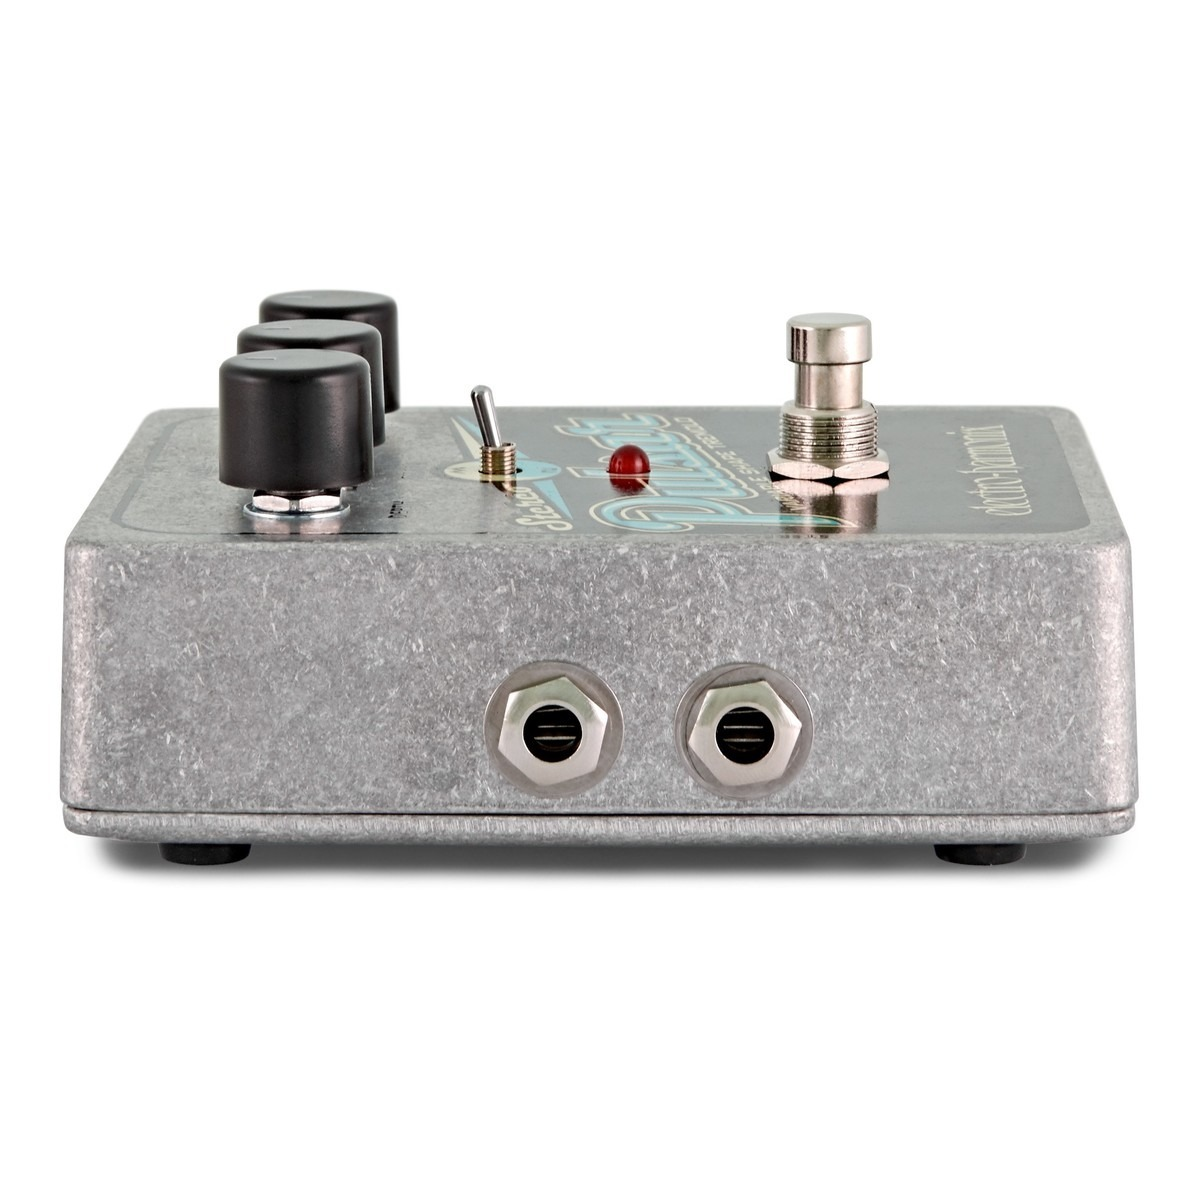 pedal ehx stereo pulsar analog tremolo electro harmonix r 740 00 em mercado livre. Black Bedroom Furniture Sets. Home Design Ideas